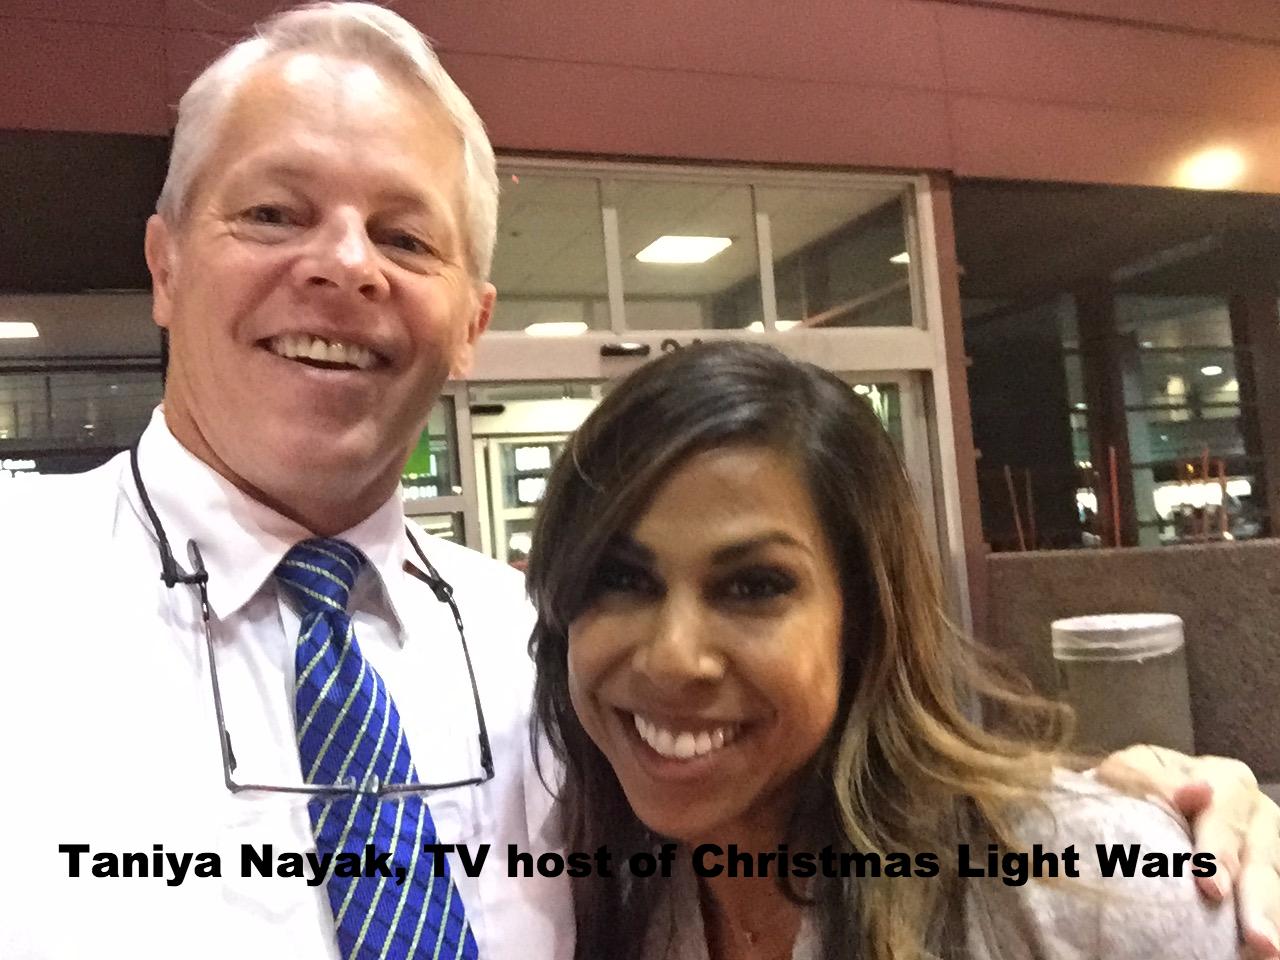 Taniya Nayak host of Christmas Light War